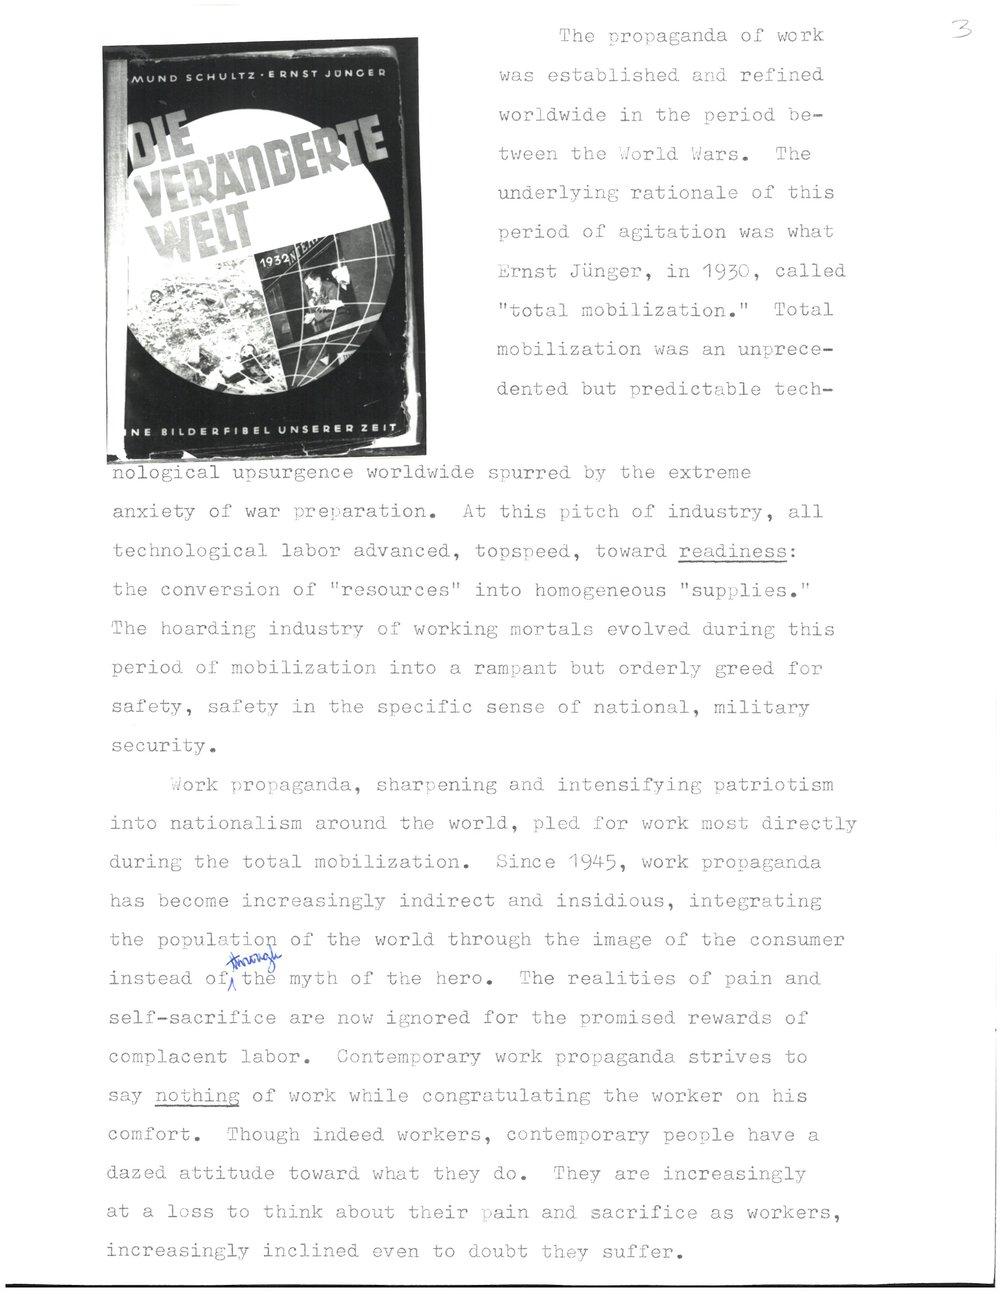 Propaganda_Page_05.jpg